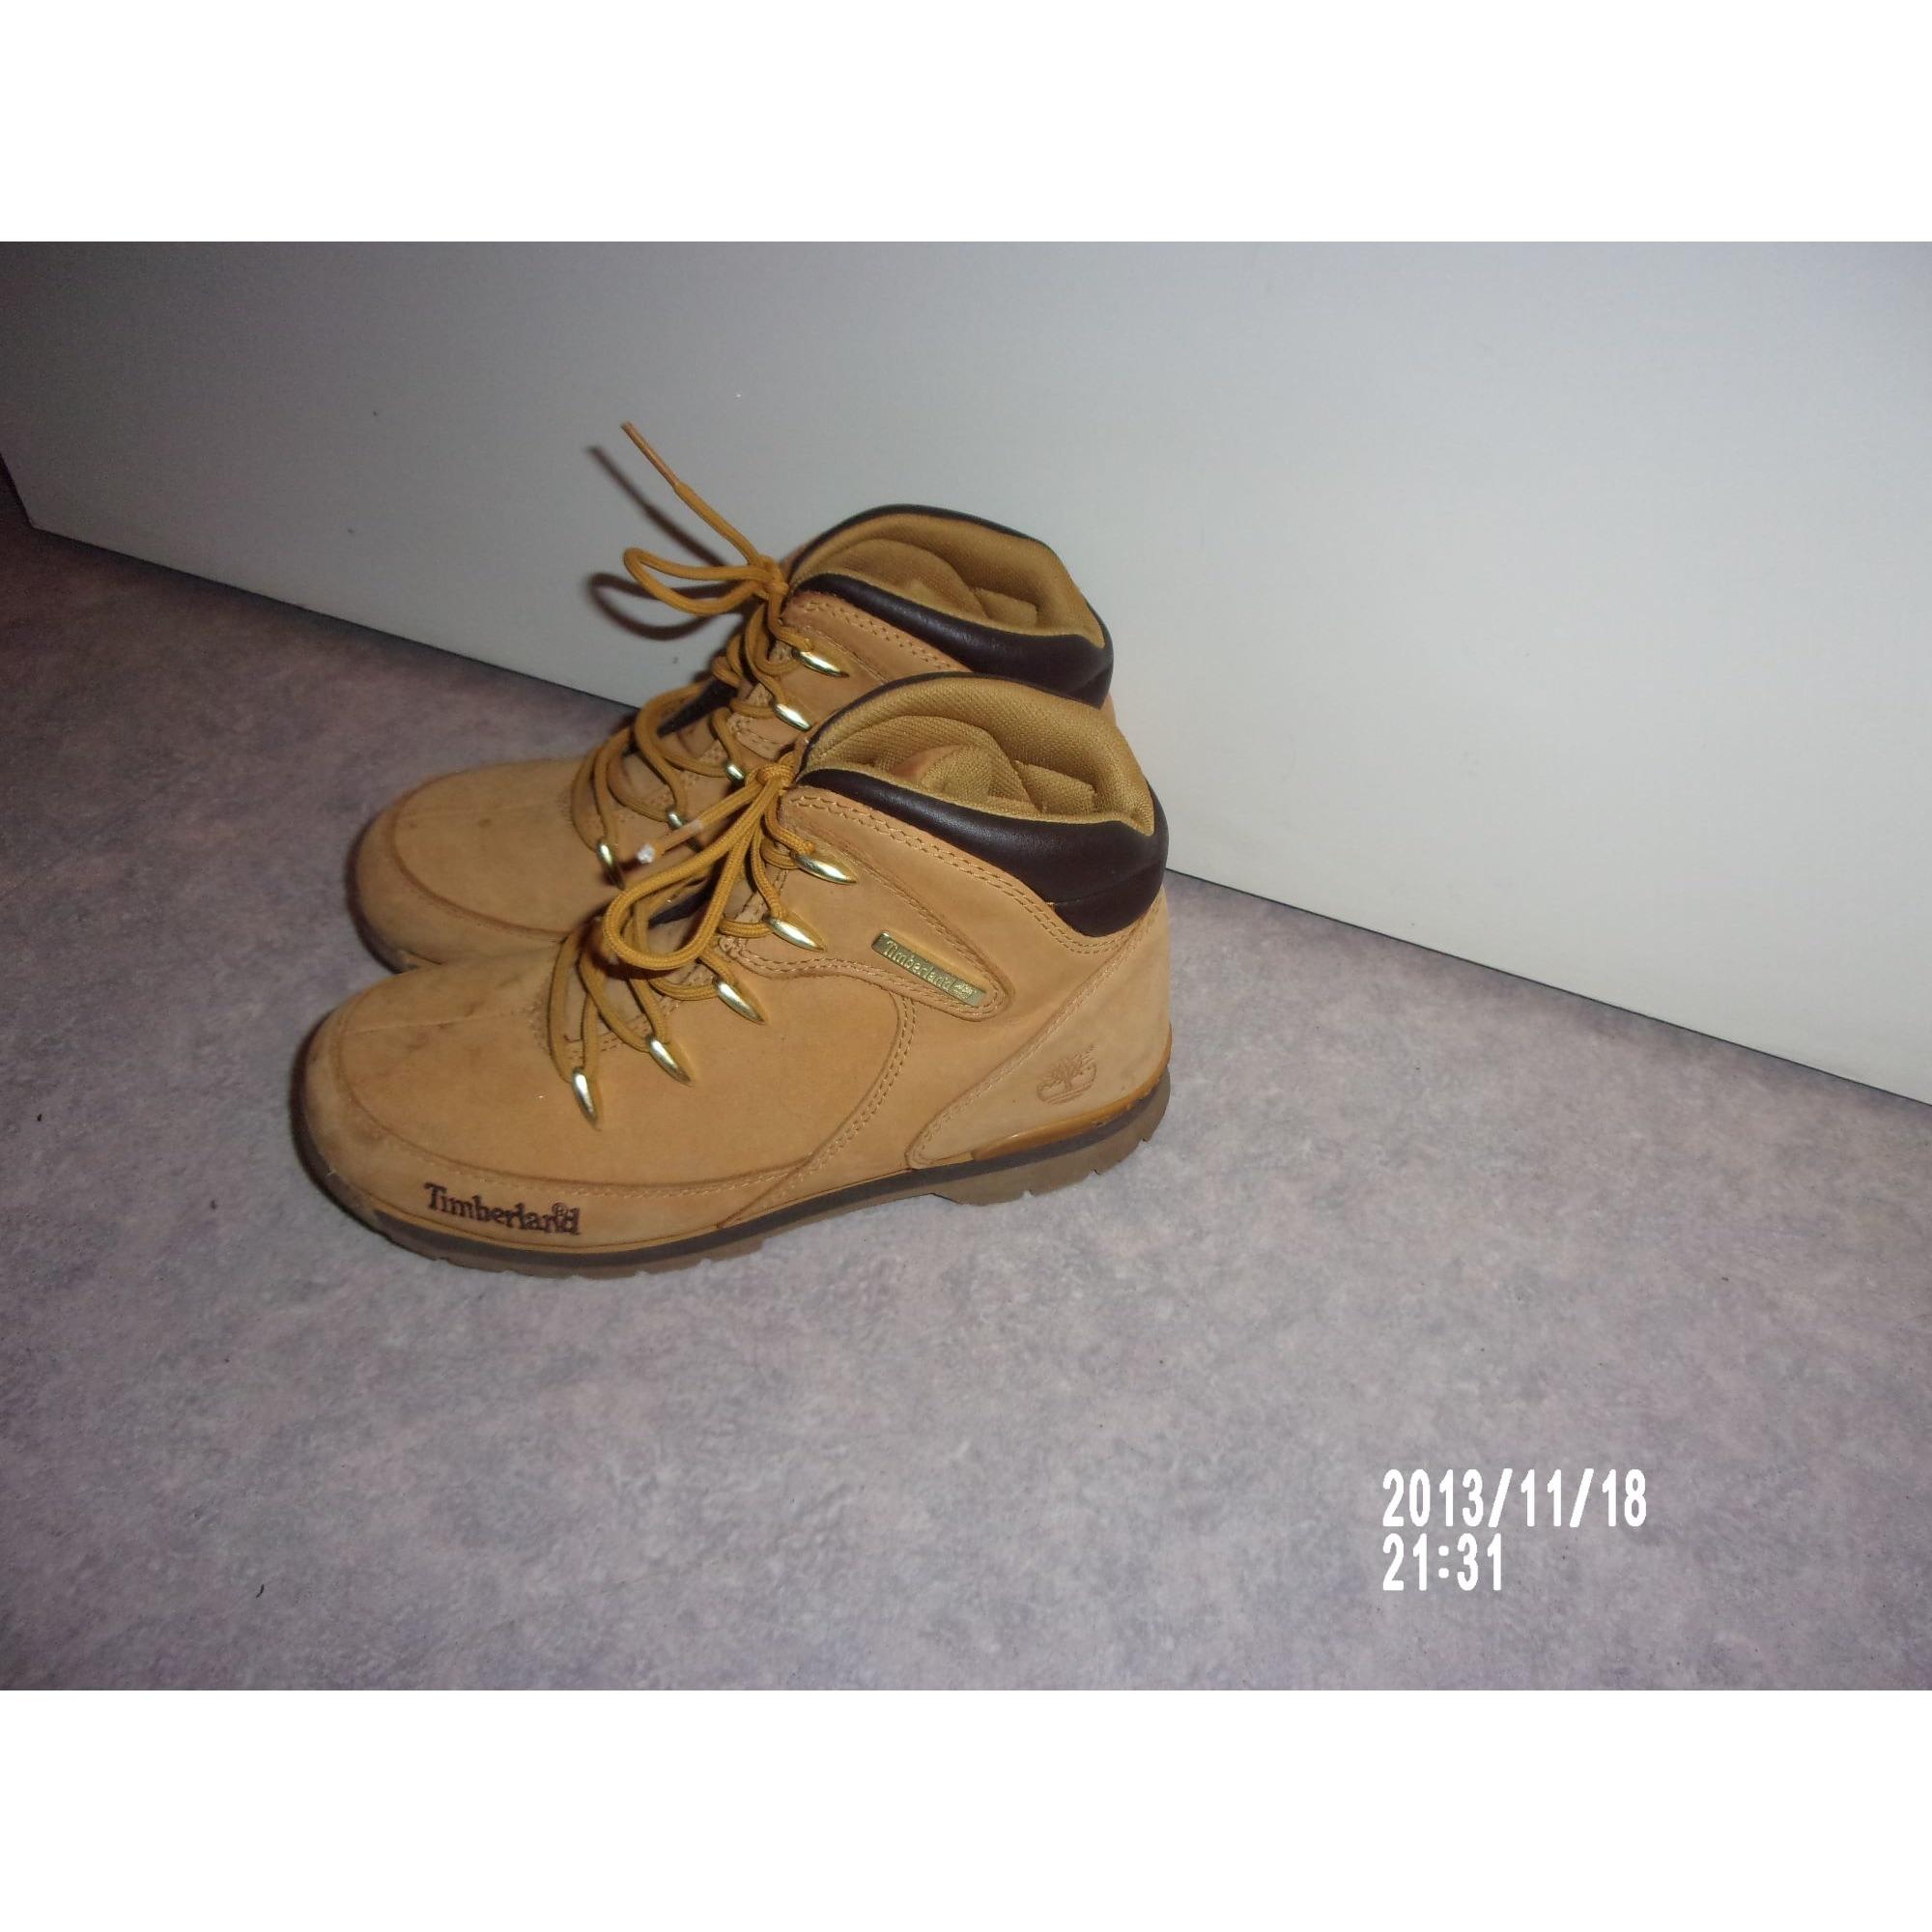 À Jaune 8660077 Timberland Lacets 36 Chaussures 54cals3rjq mNn08w